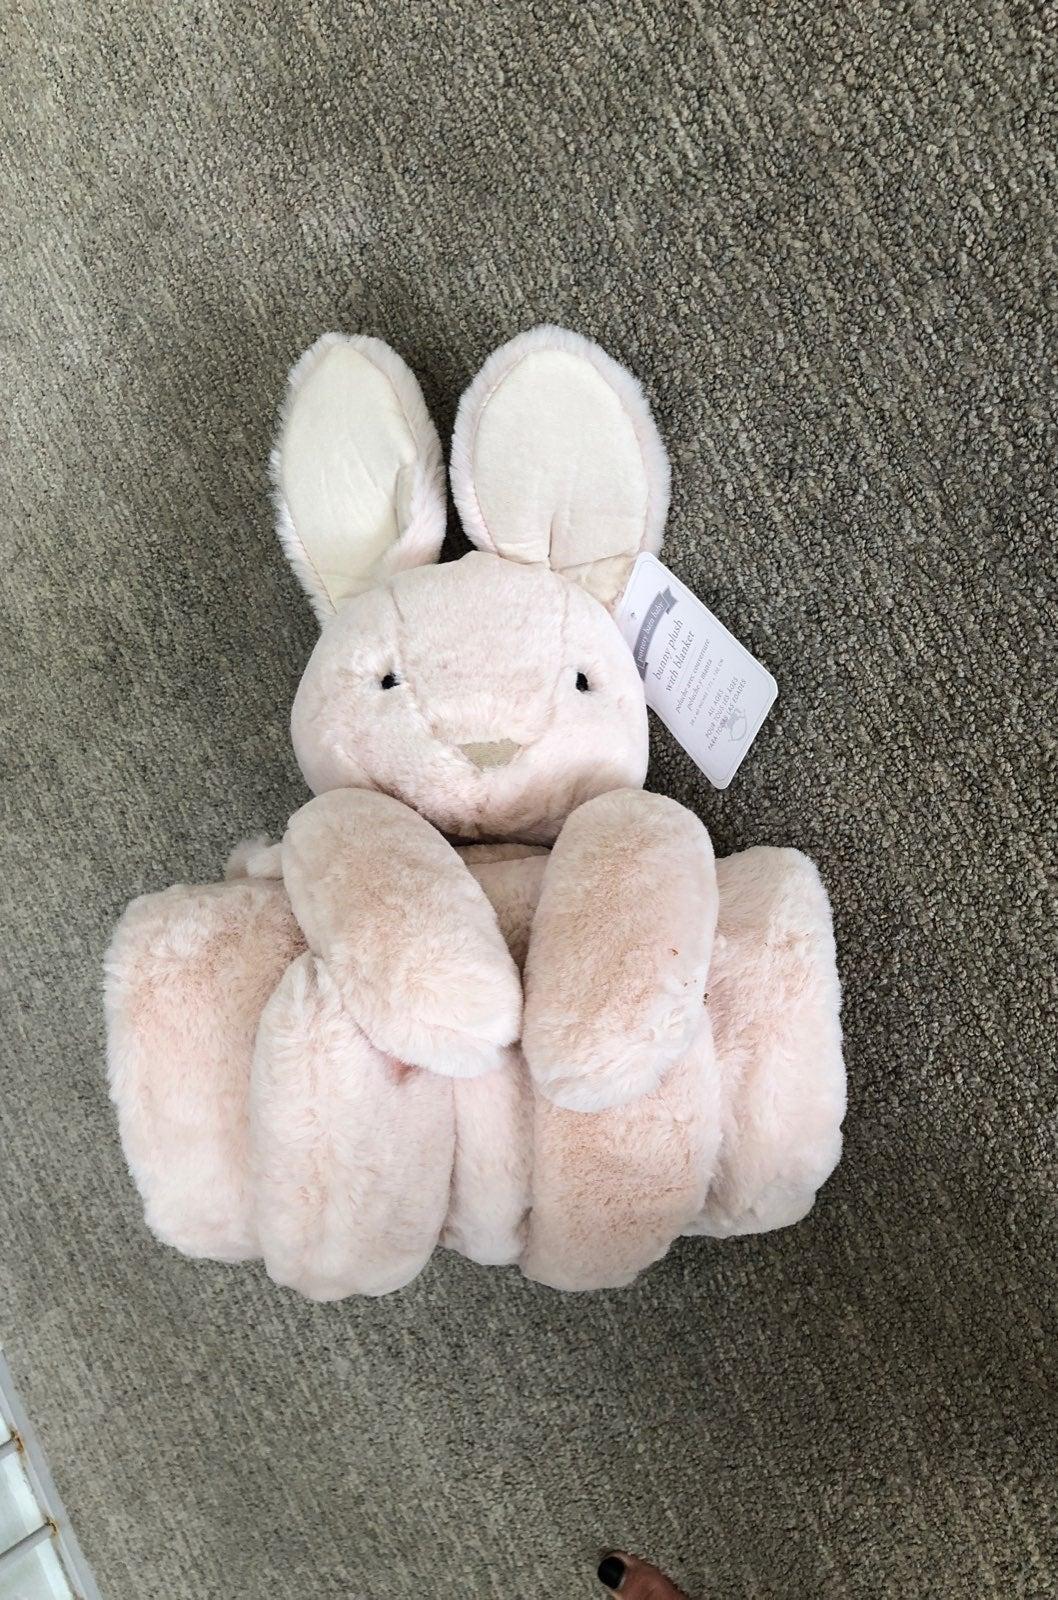 Pottery Barn Kids Plush Bunny with Blank